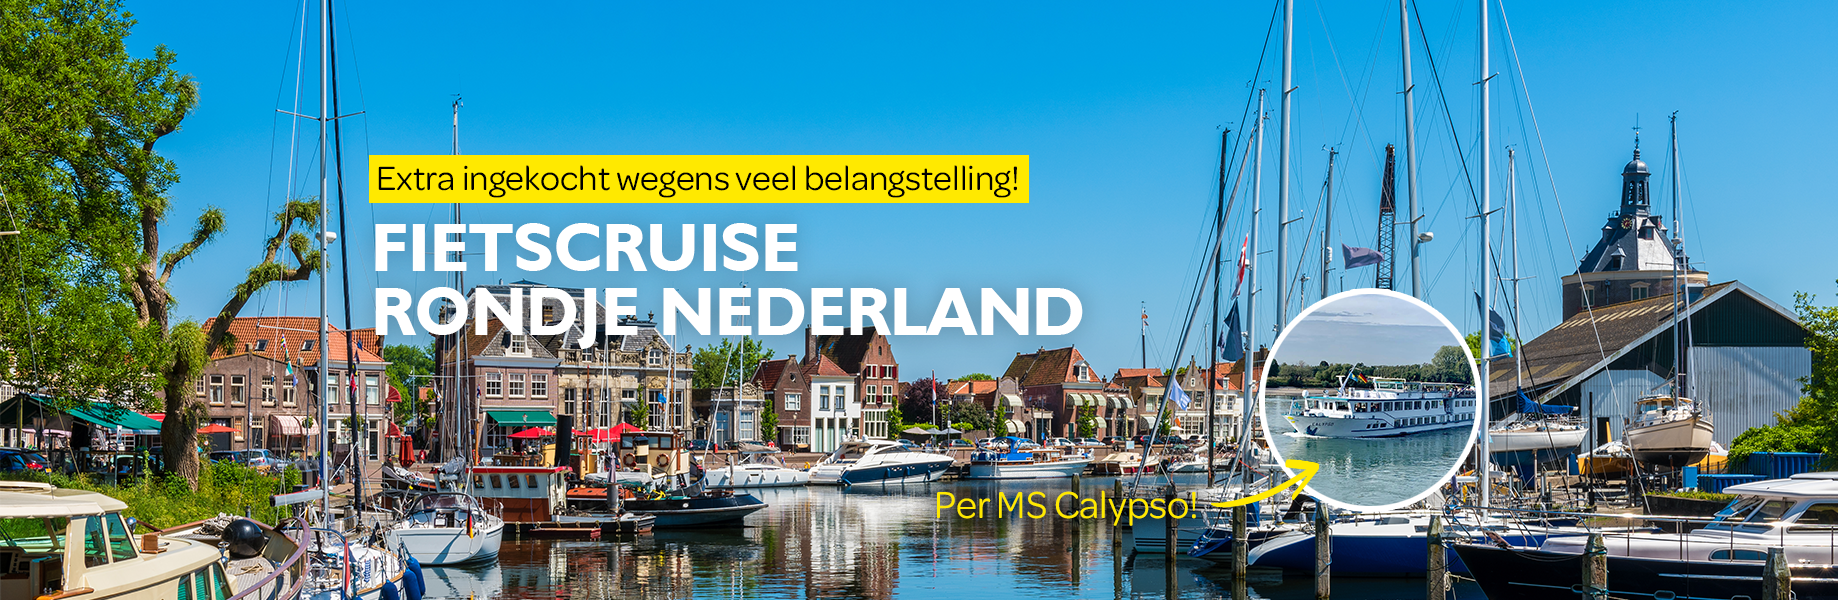 Homepage Fietscruise rondje Nederland